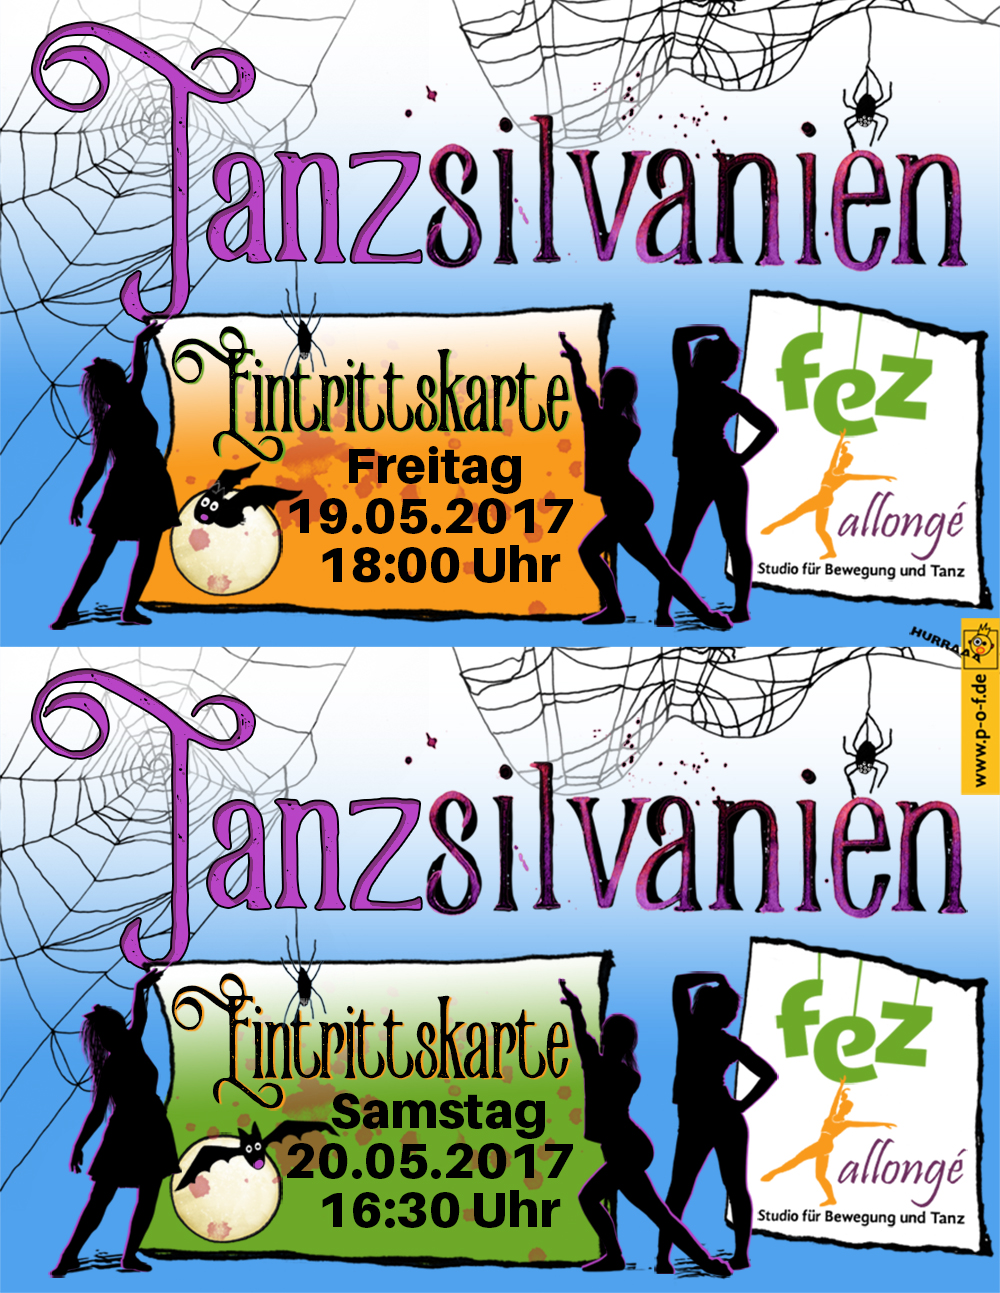 Eintrittskarten - Allongé - Tanzmärchen 2017 - Tanzsilvanien